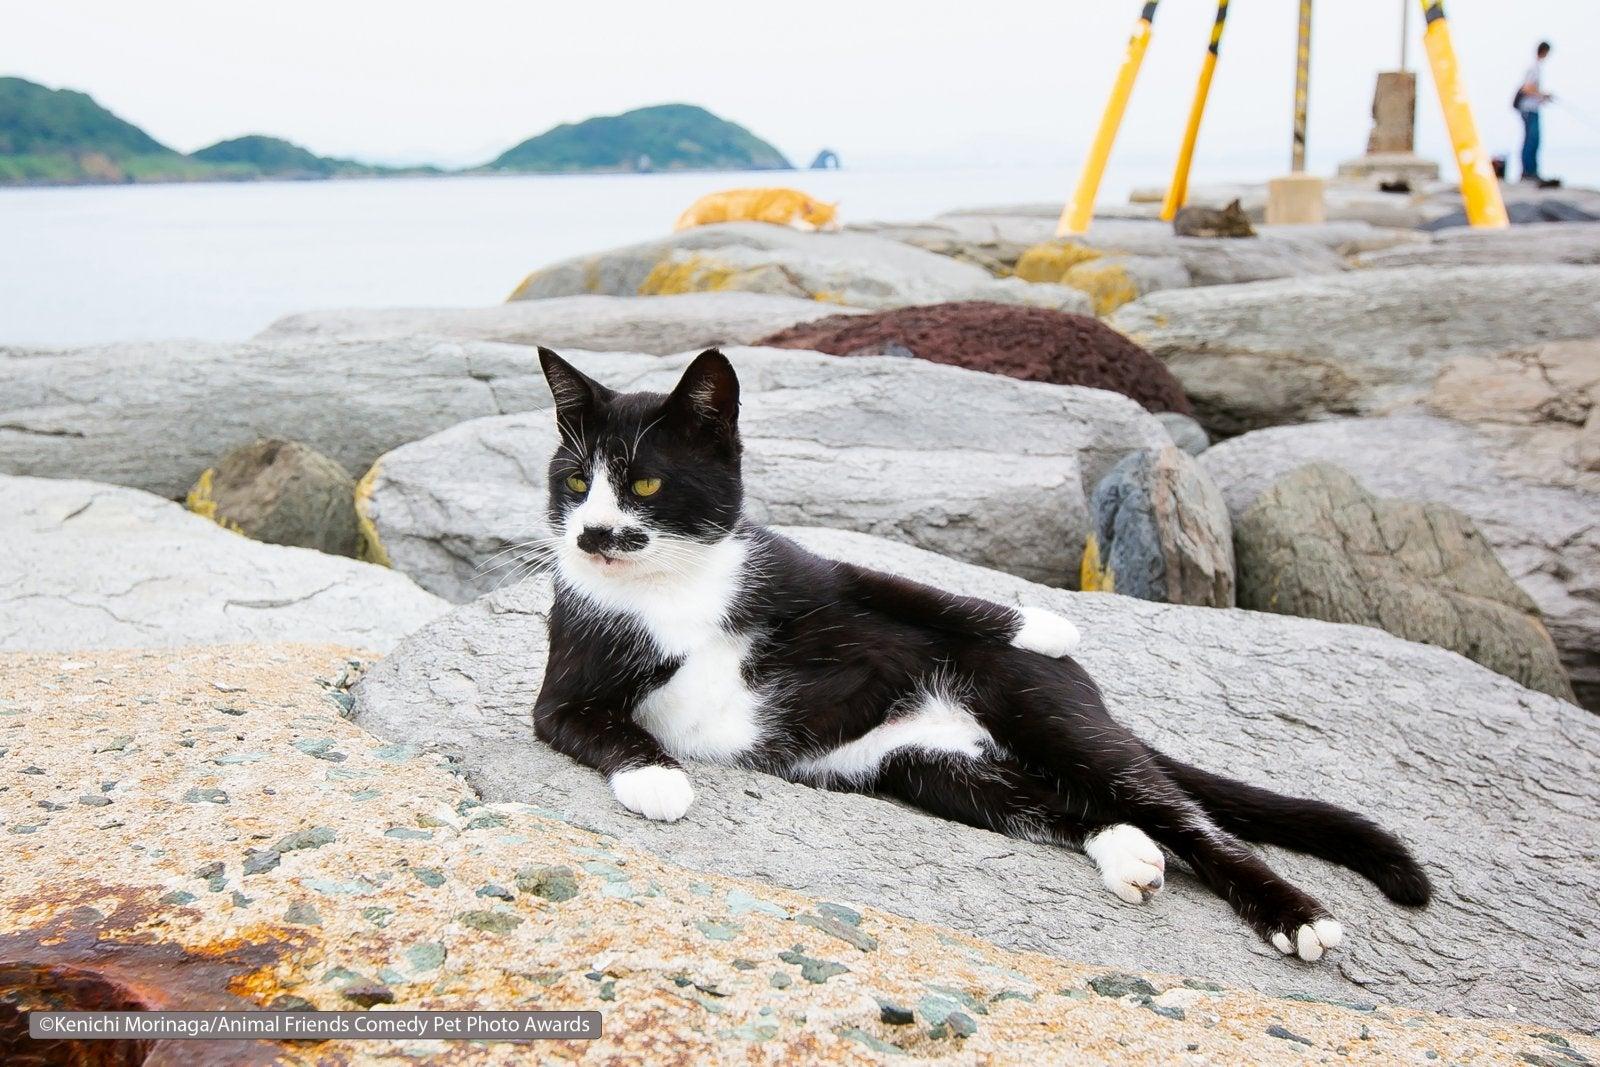 Kenichi Morinaga/Animal Friends Comedy Pet Photo Awards